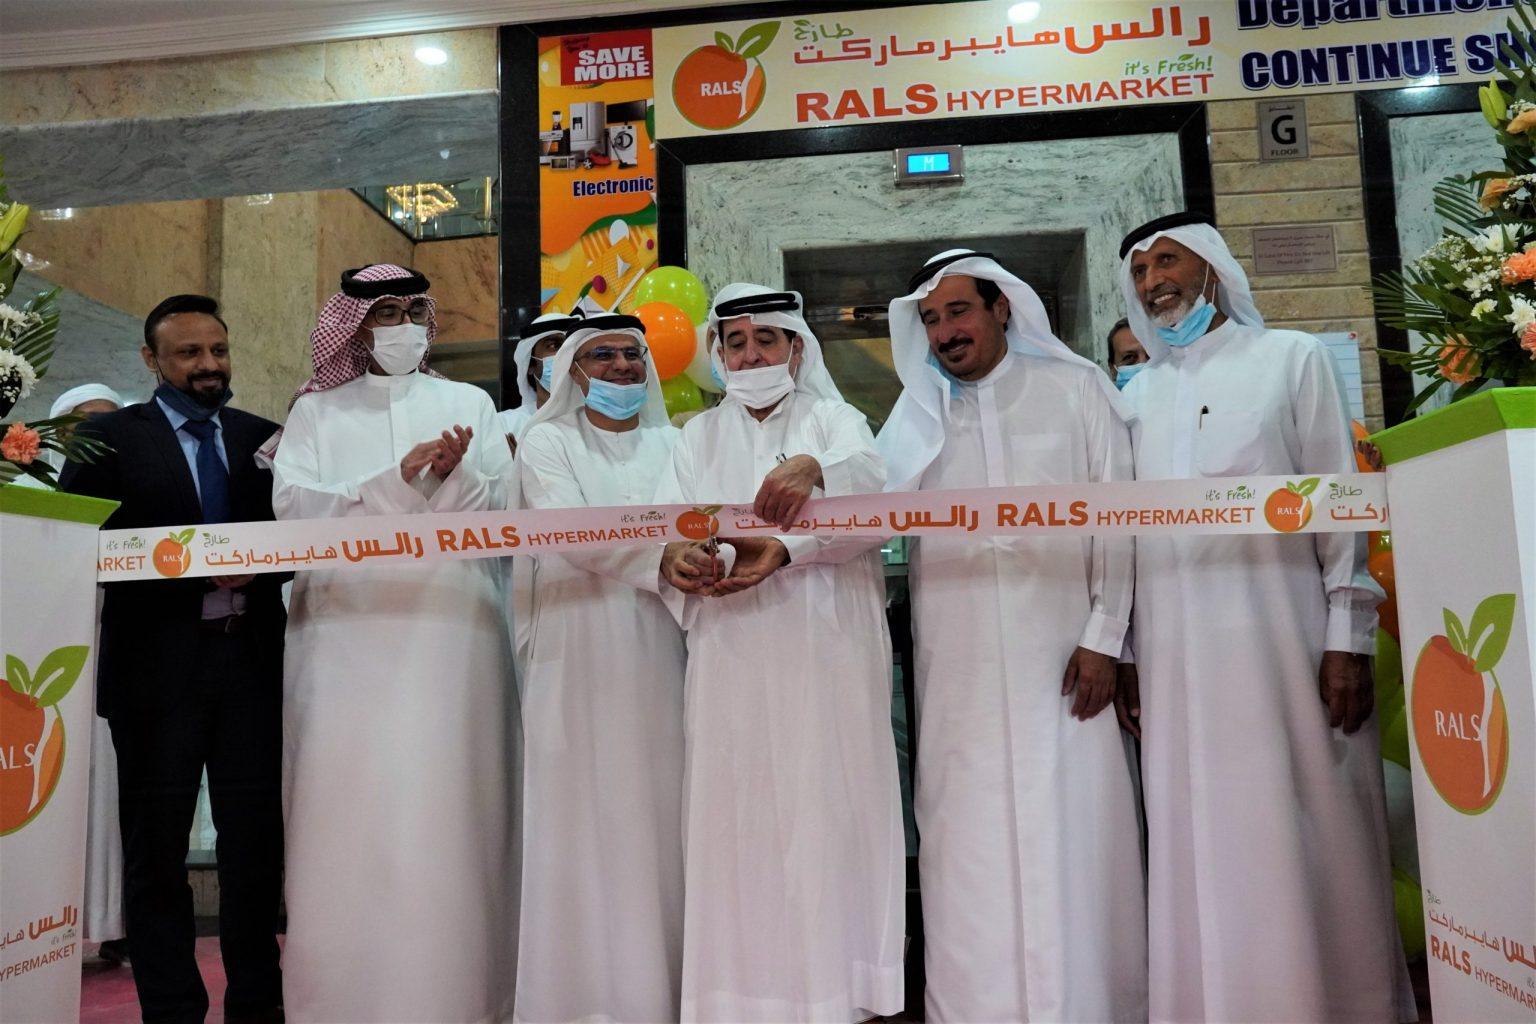 RALS Hypermarket - Grand Opening Ribbon cutting